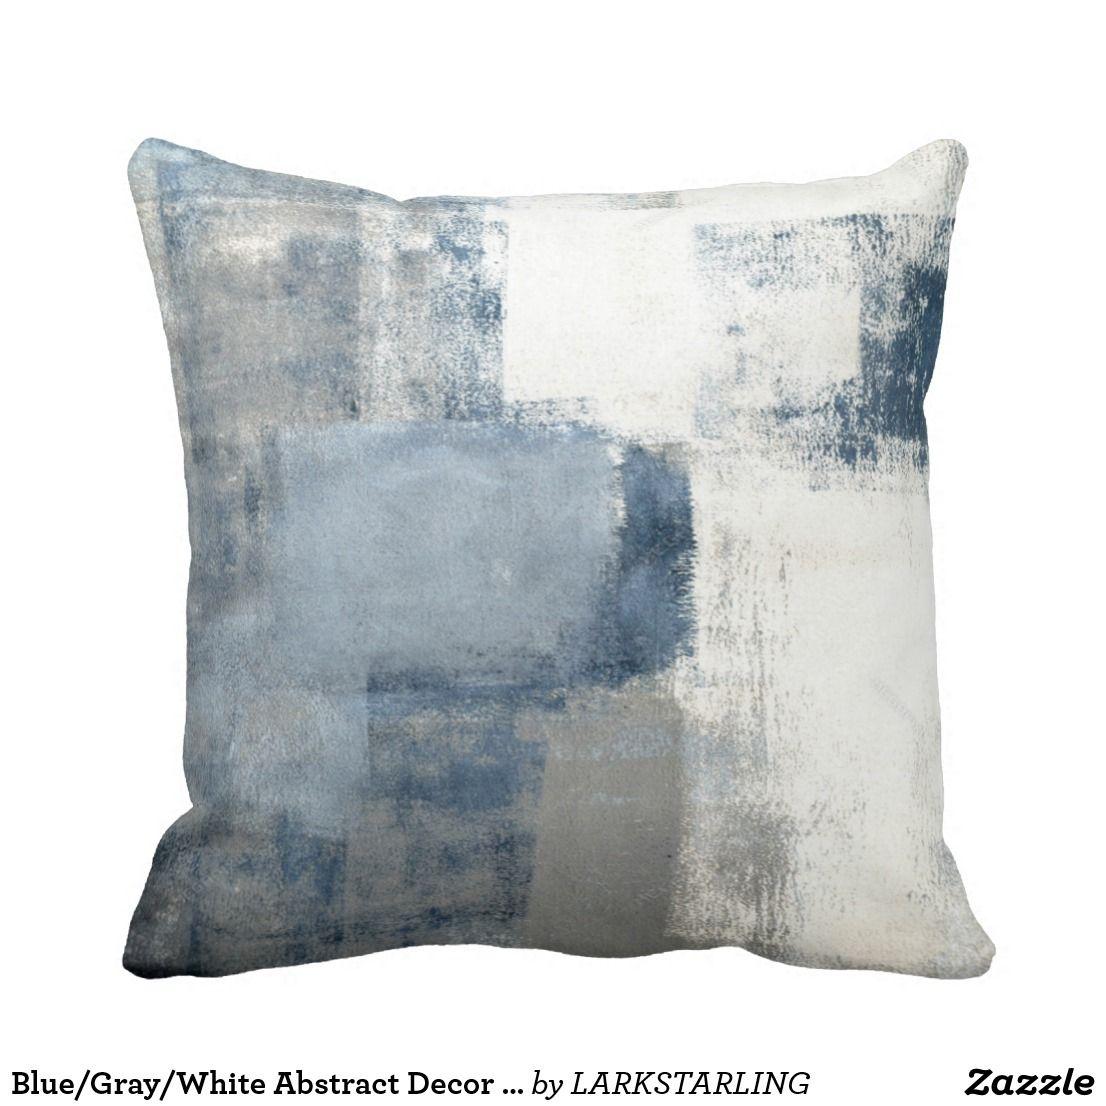 Bluegraywhite abstract decor pillow decor pillows pinterest